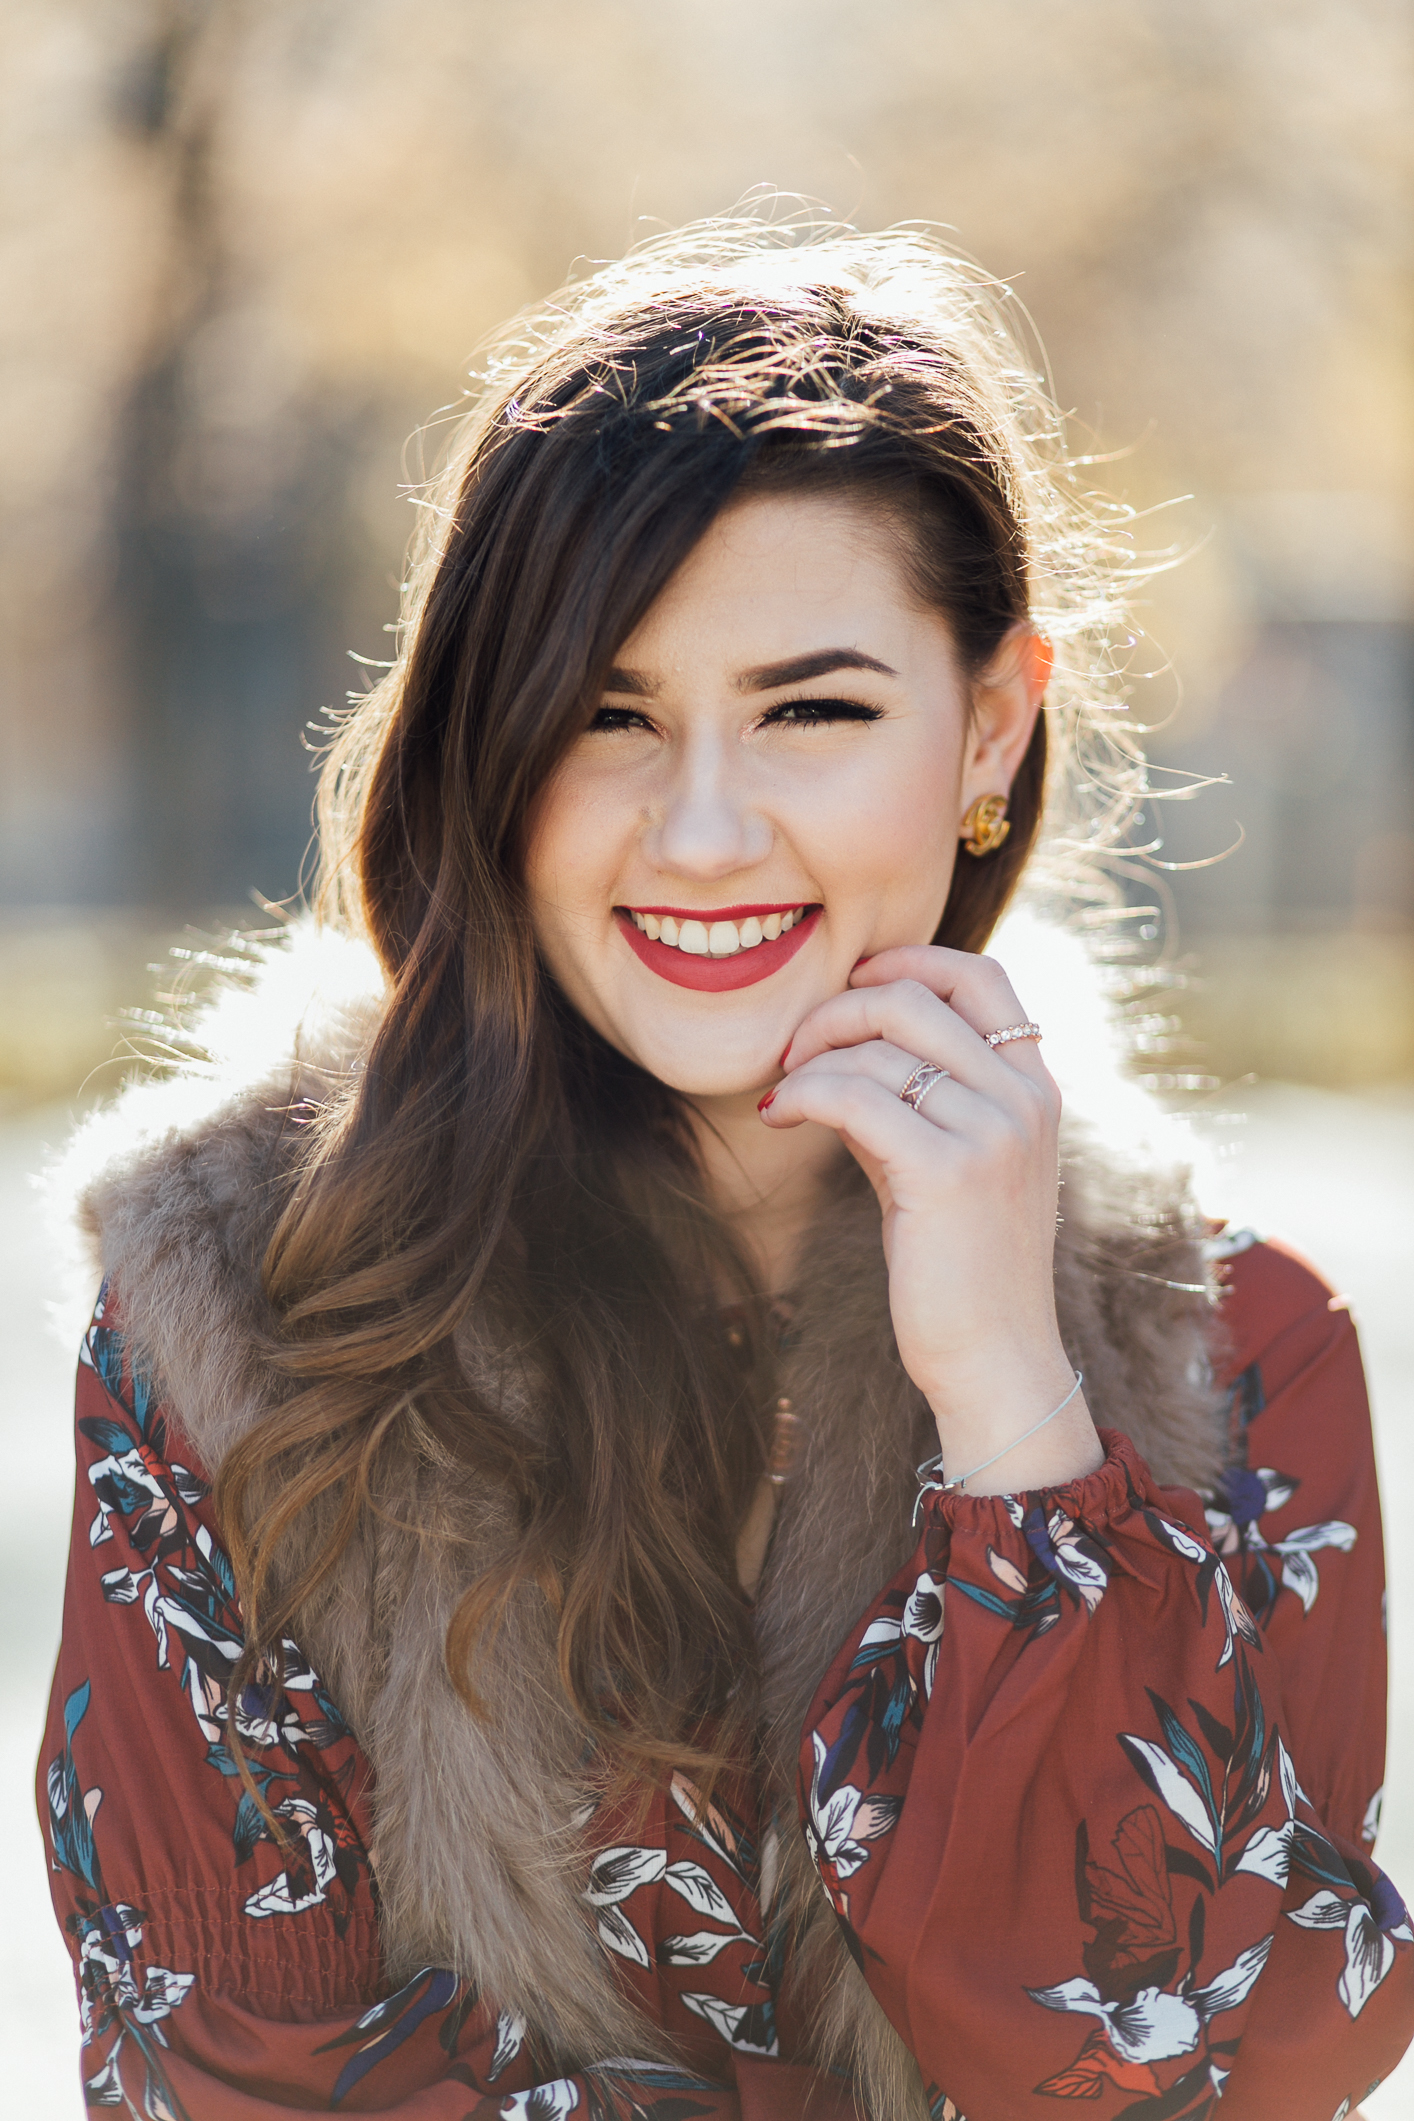 Sara-Bow-Blogger-Beratung-Profil-Bild